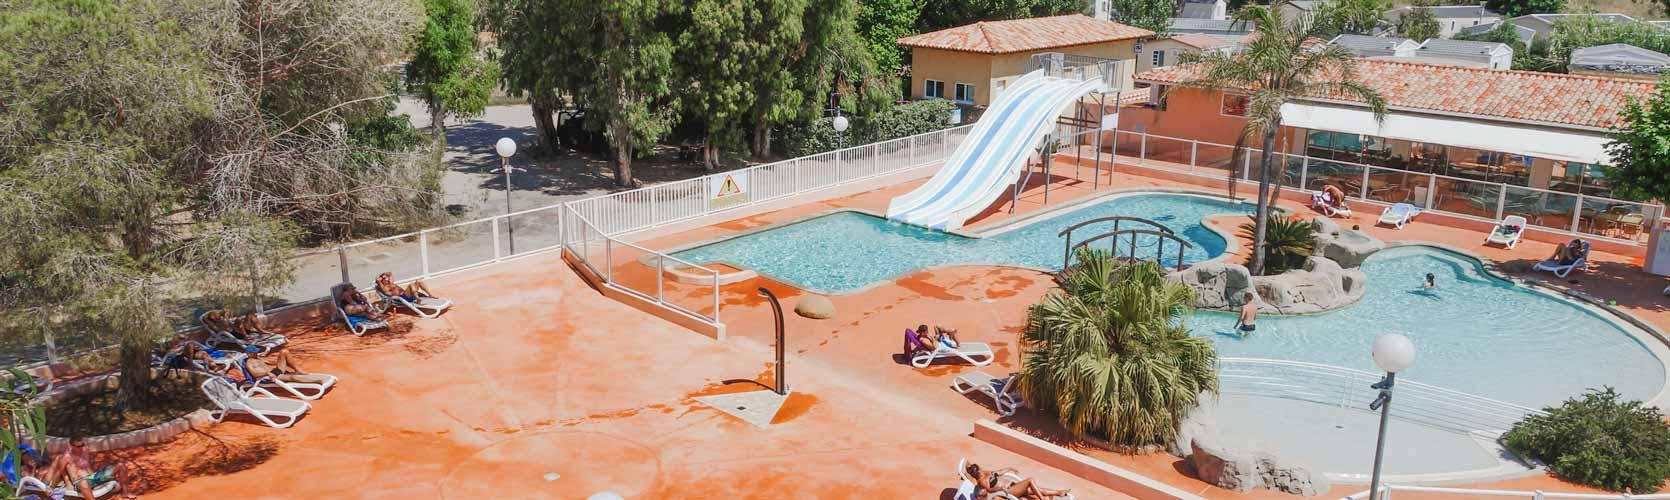 camping en corse avec piscine à Calvi